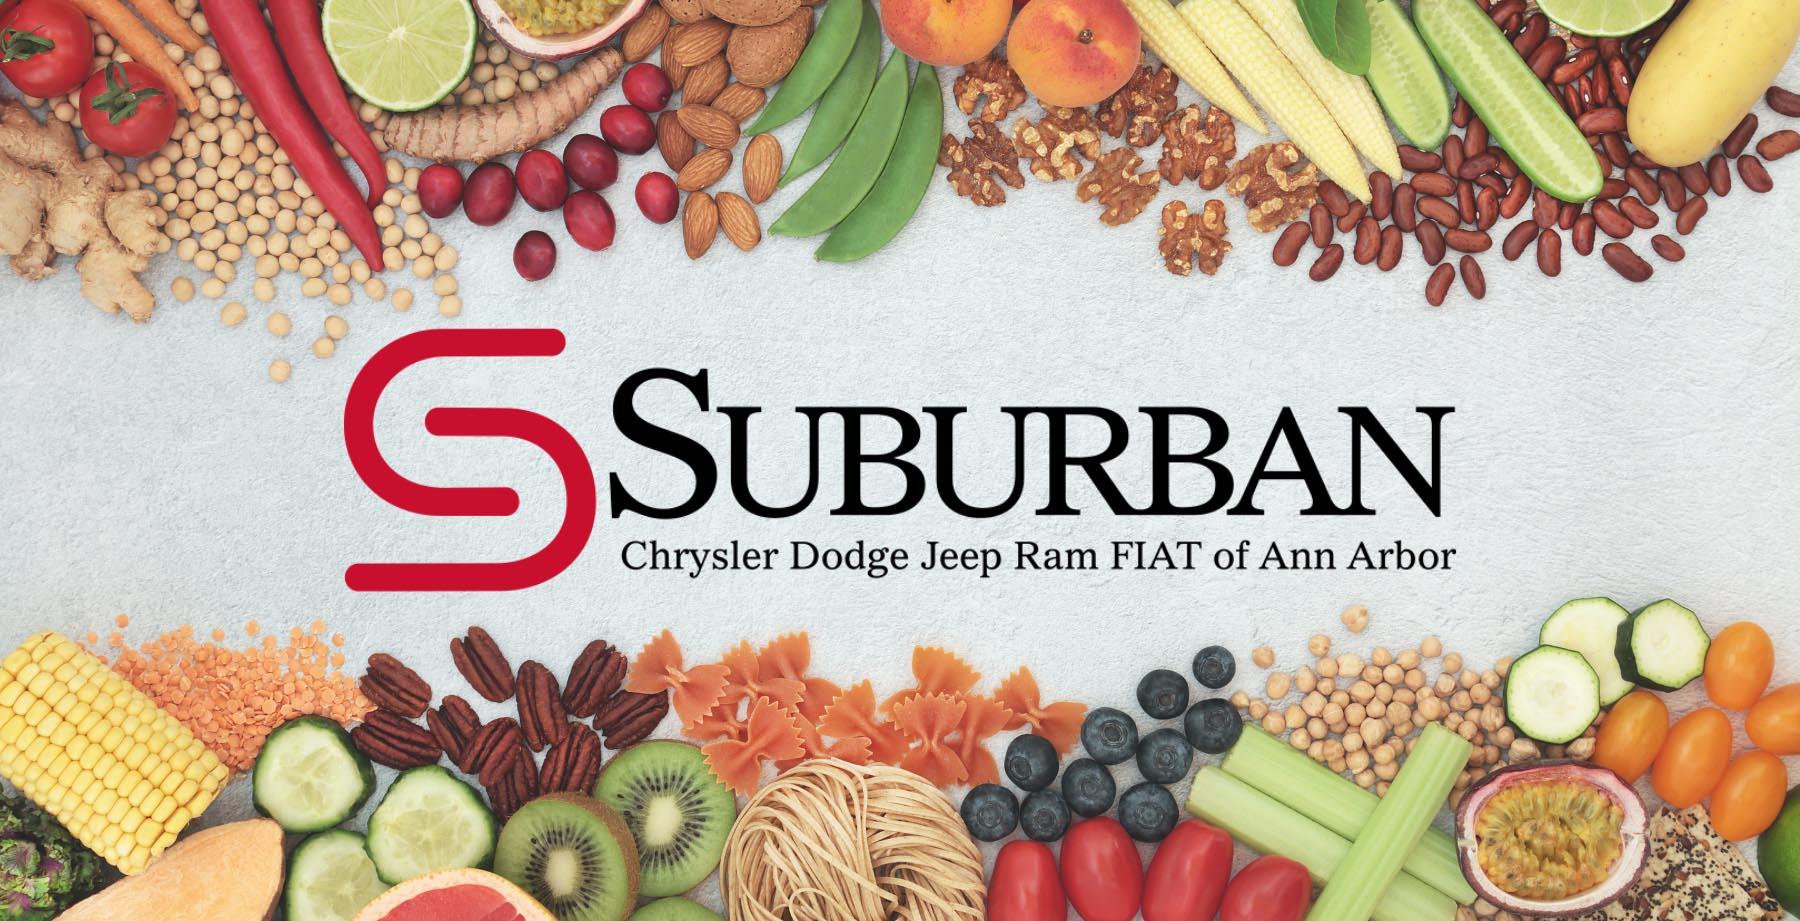 Suburban Chrysler Dodge Jeep Ram Fiat of Ann Arbor